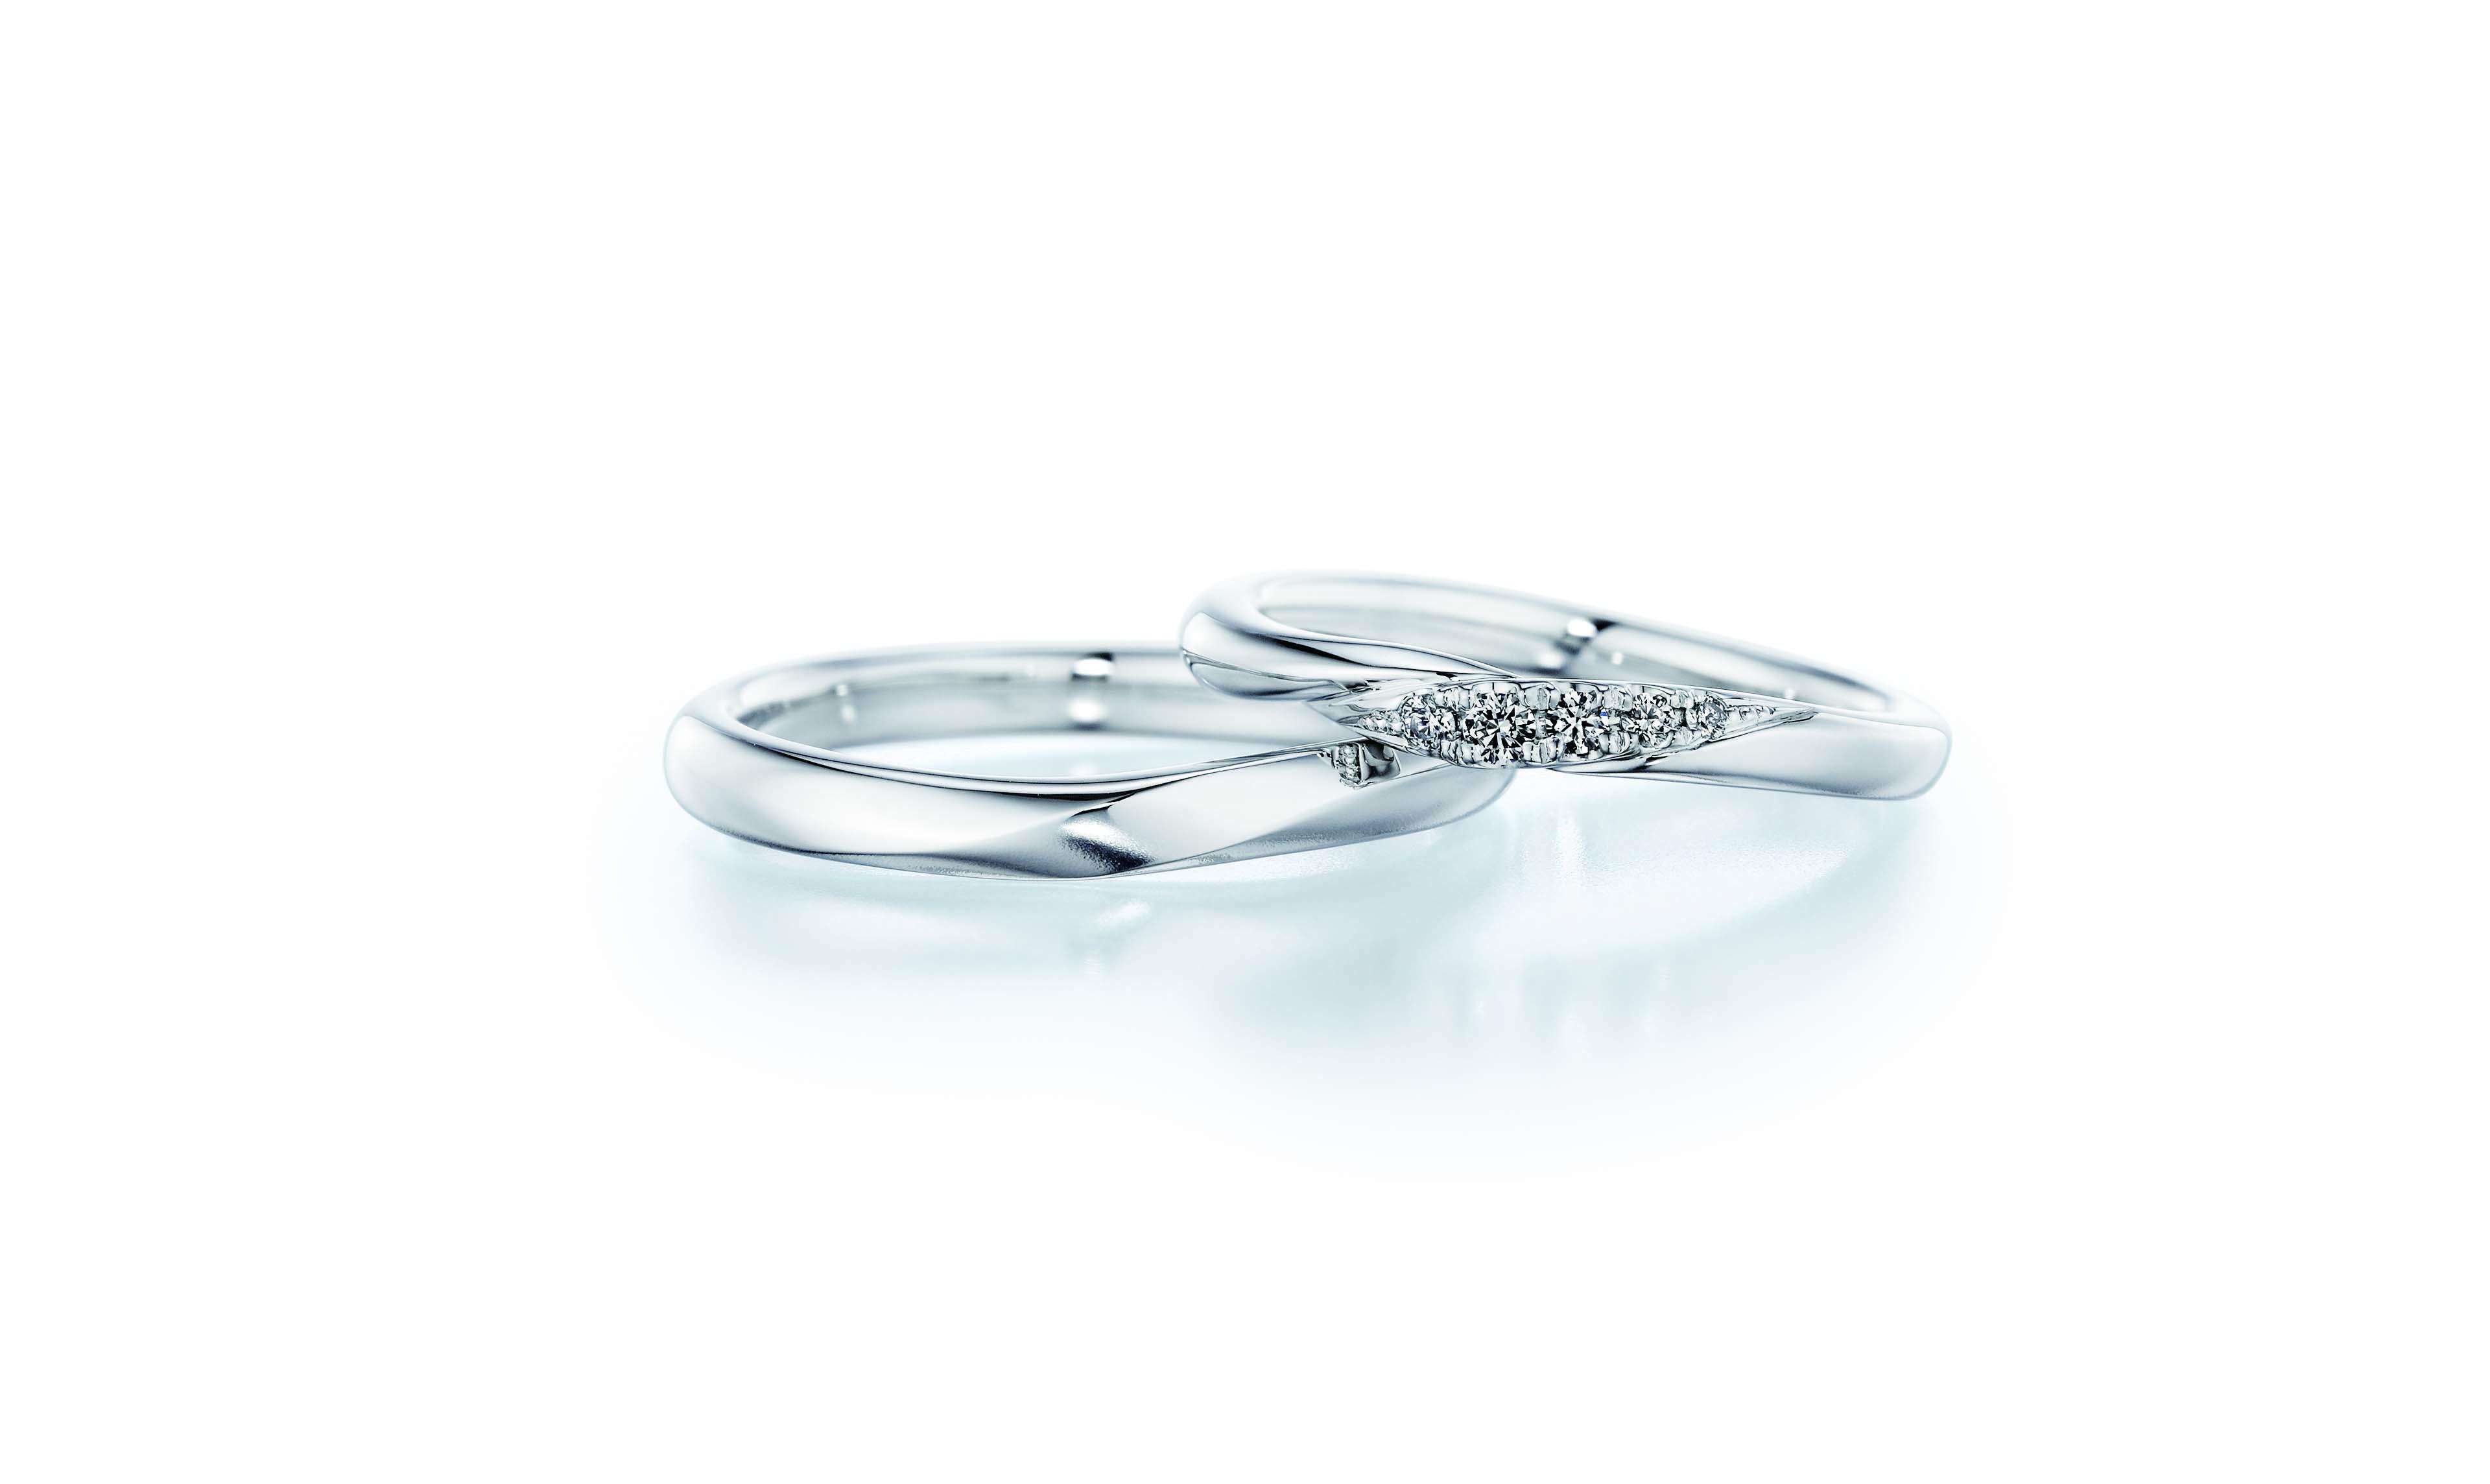 GINZA DIAMOND SHIRAISHI 銀座白石歡慶周年 新娘季幸福獻禮_商訊-多維新聞網